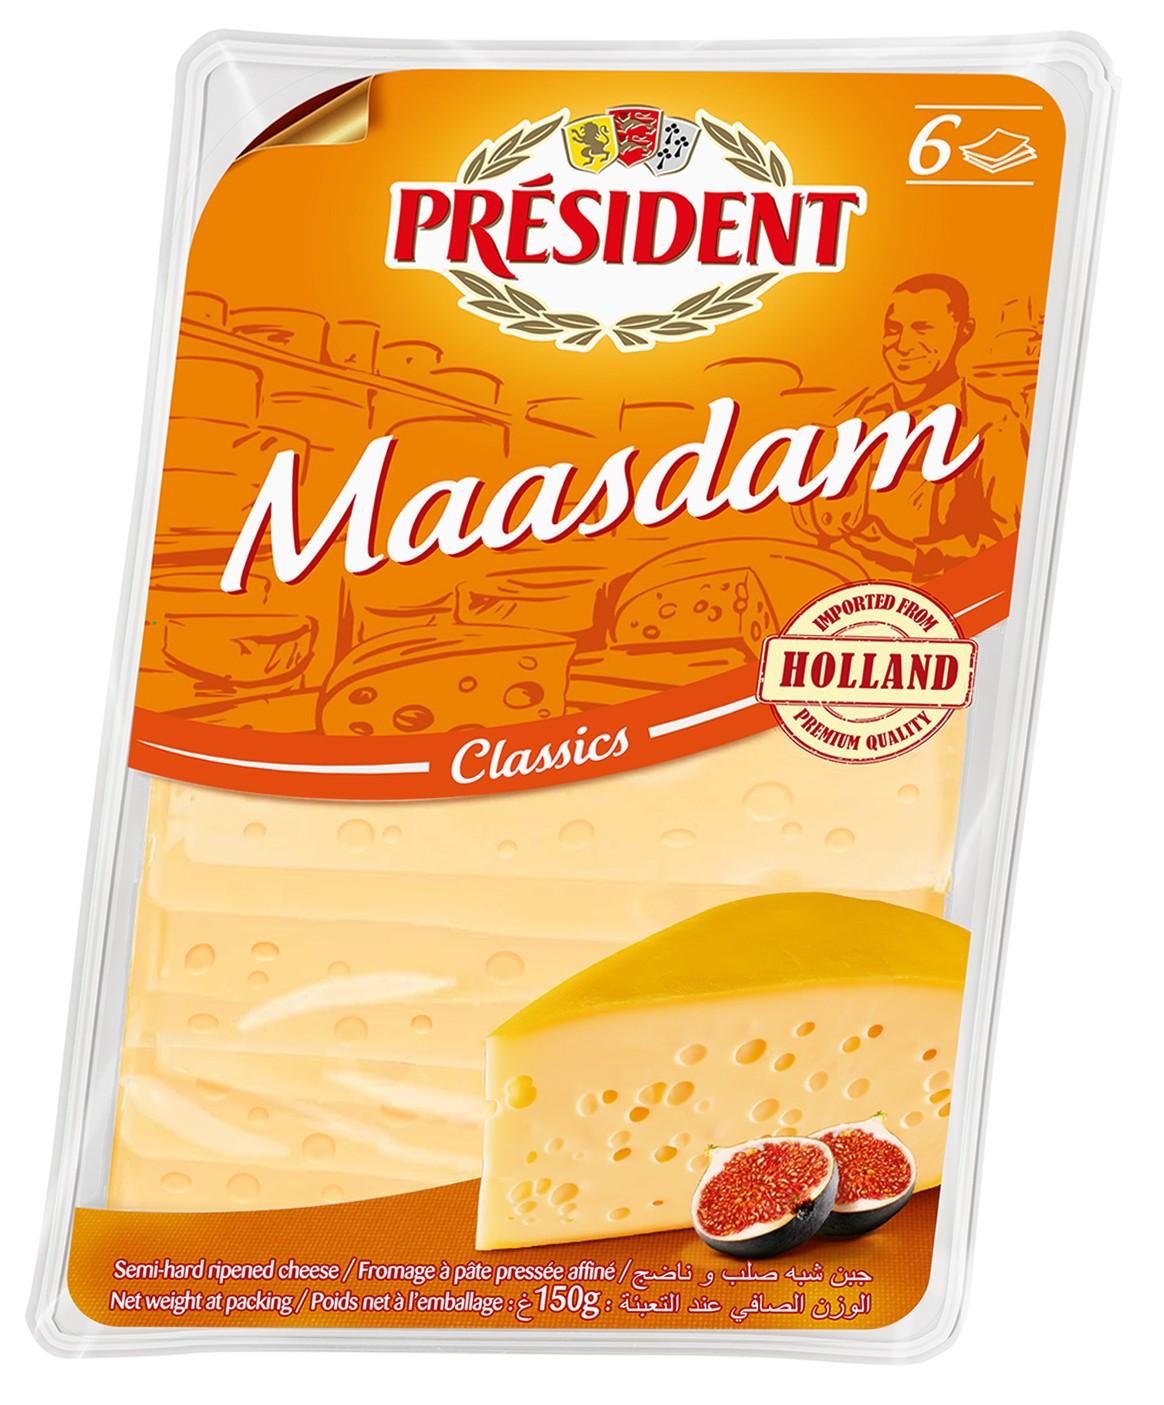 Сир твердий Мааздам скибками 46% PRESIDENT фото